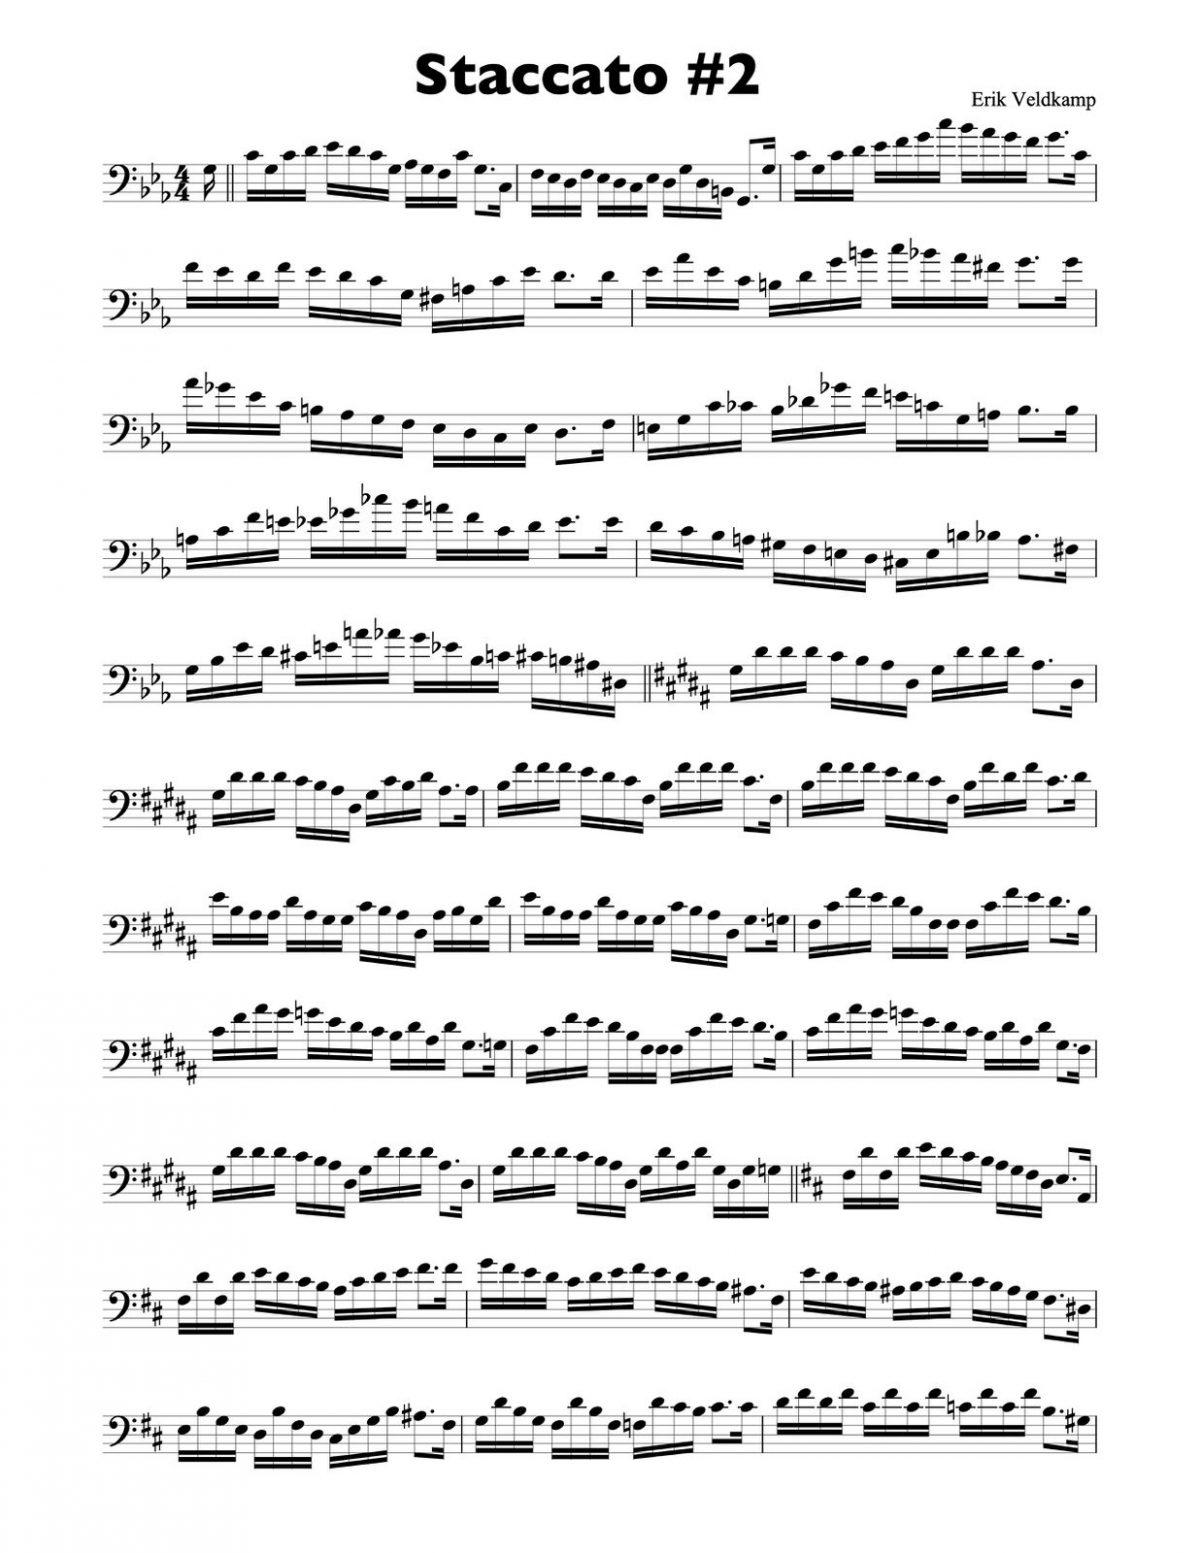 Veldkamp, 15 Advanced Staccato Studies in Bass Clef-p04